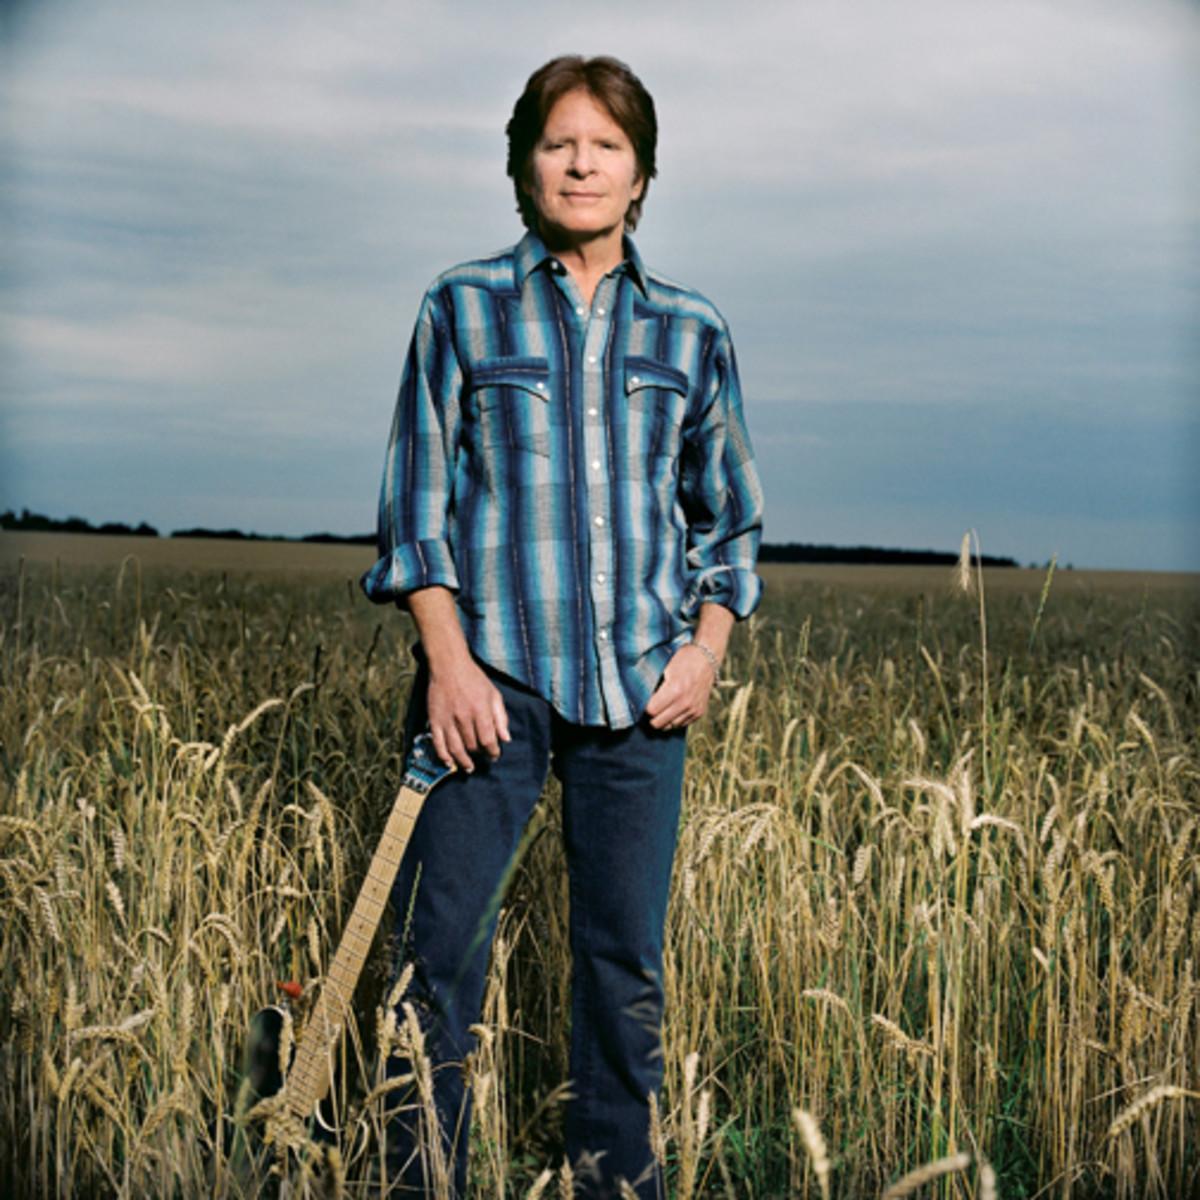 John Fogerty, photo by Nela Koenig.